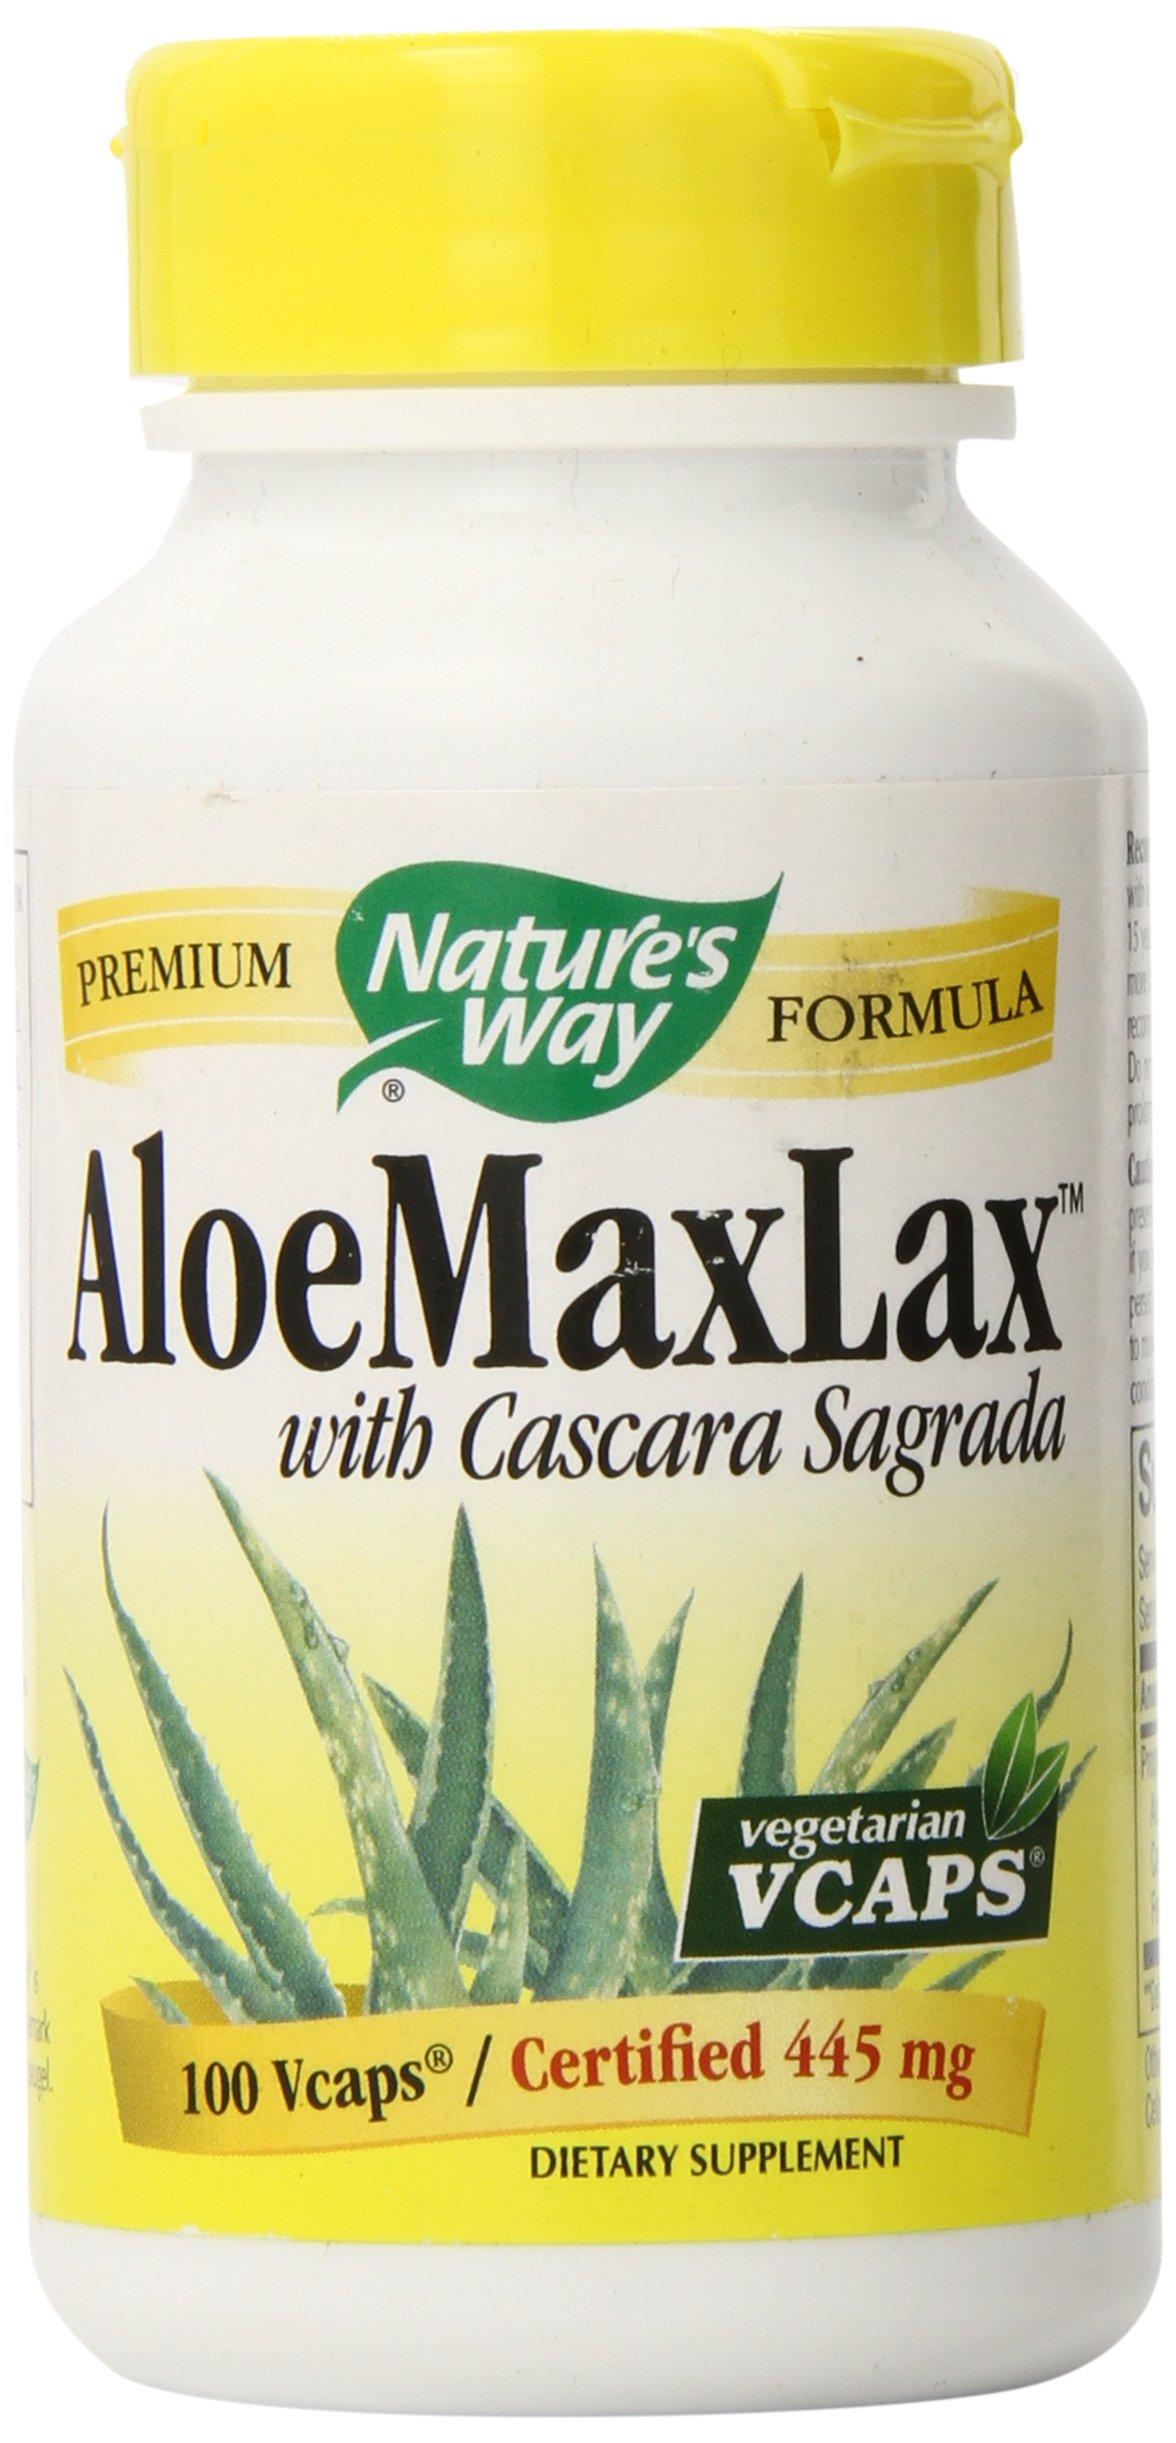 Nature's Way Aloemaxlax With Cascara Sagrada Vegetarian Capsules, 100 Count by Nature's Way